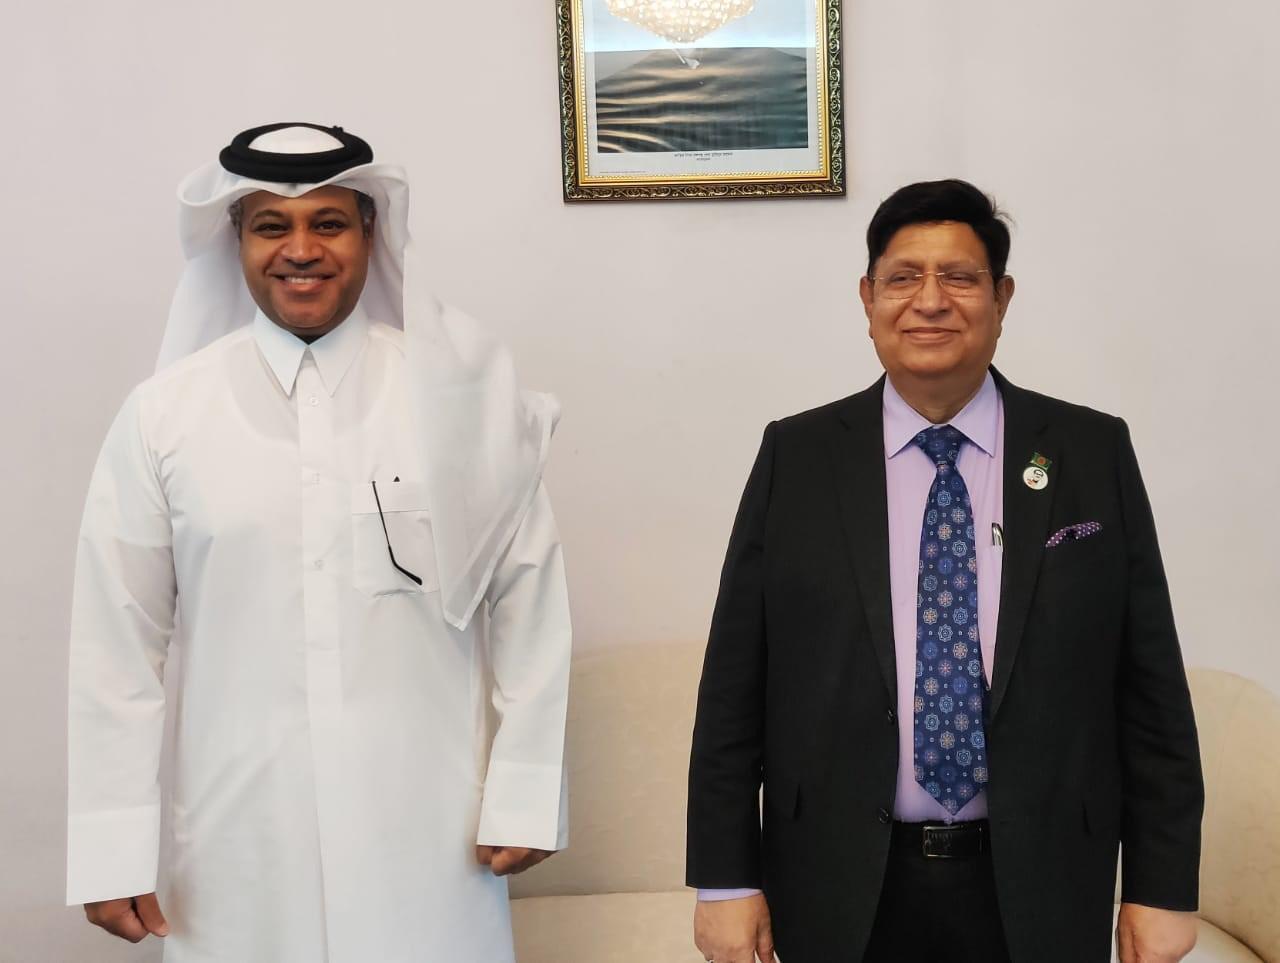 Bangladesh's Foreign Minister Meets Qatar's Ambassador